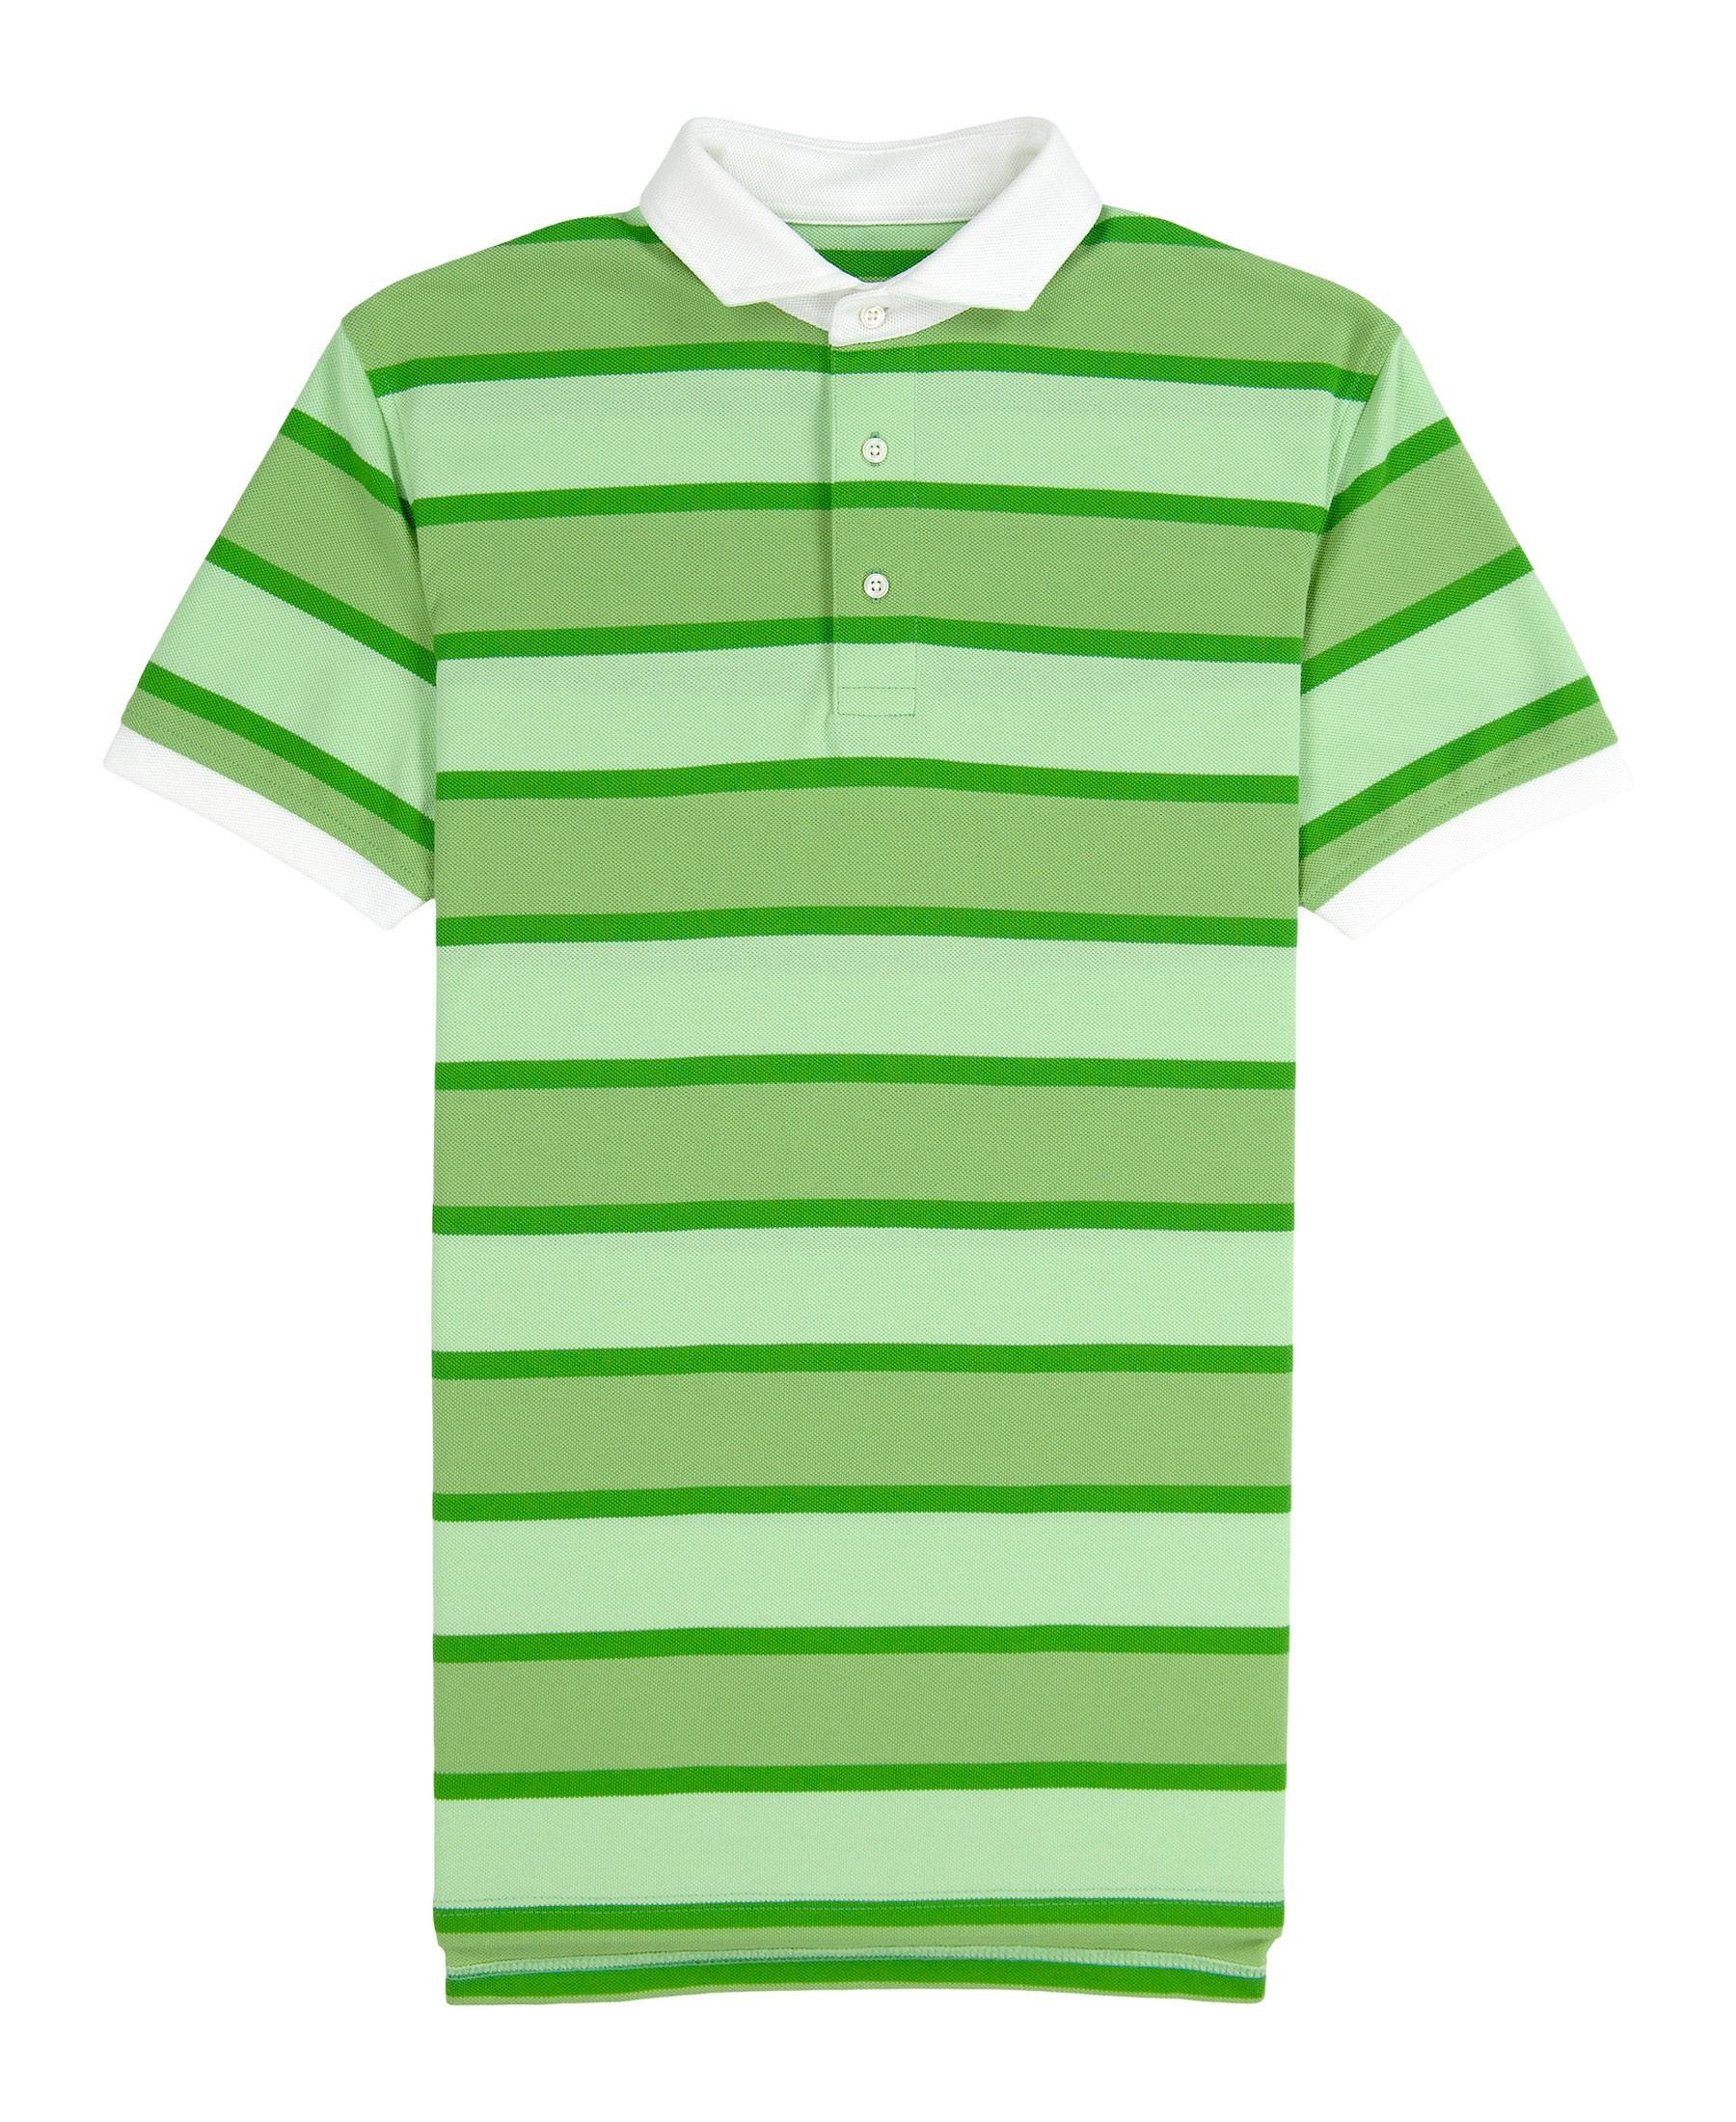 Beach Club - Spring Green Multi Stripe